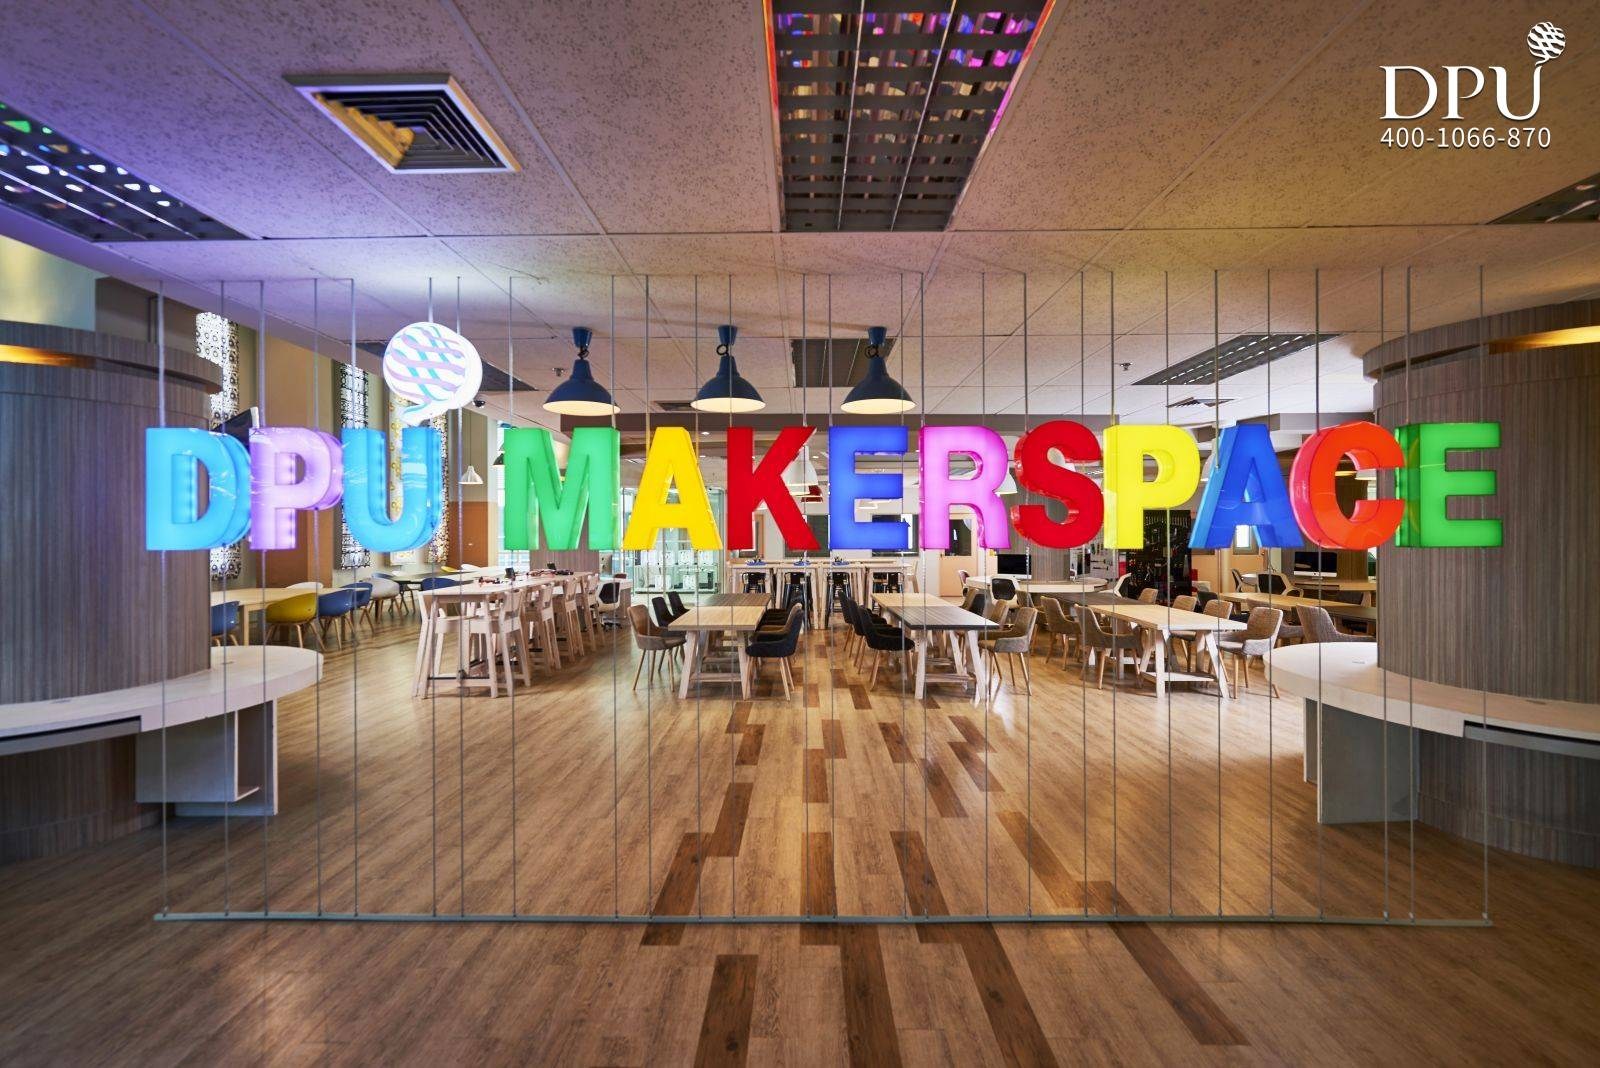 博仁大学 Maker Space